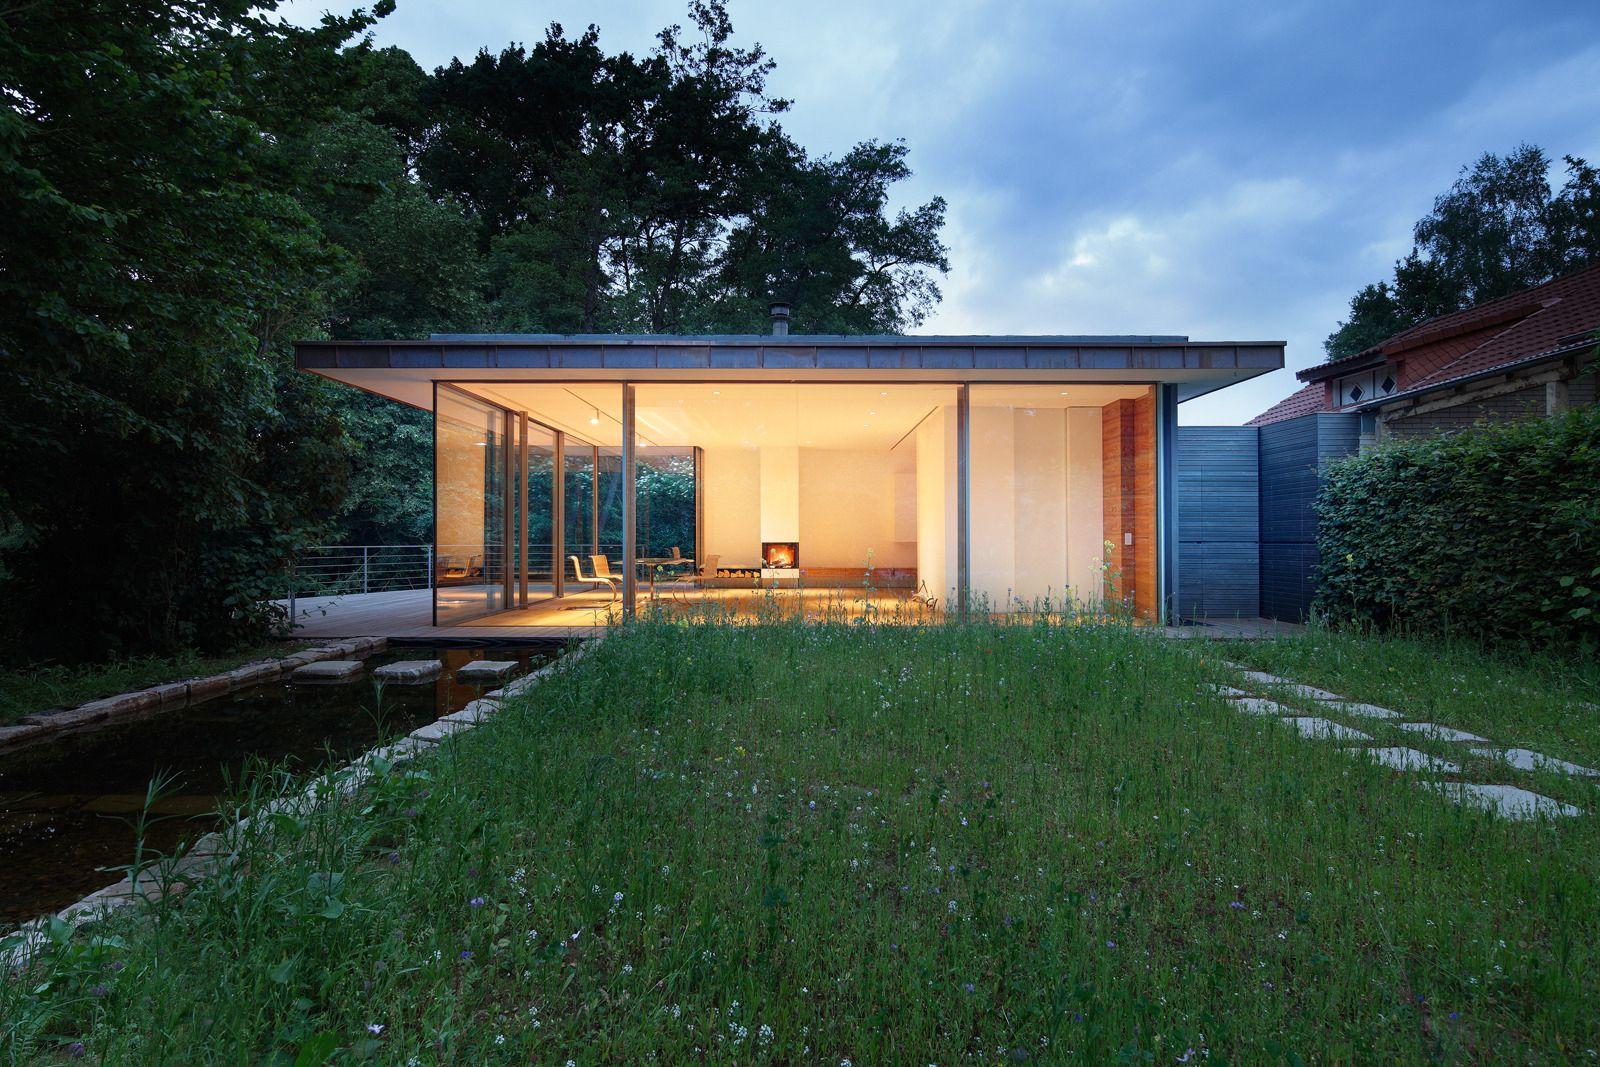 Photo 1 Of 6 In House Rheder Ii By Falkenberg Innenarchitektur German Houses Weekend House Modern House Design